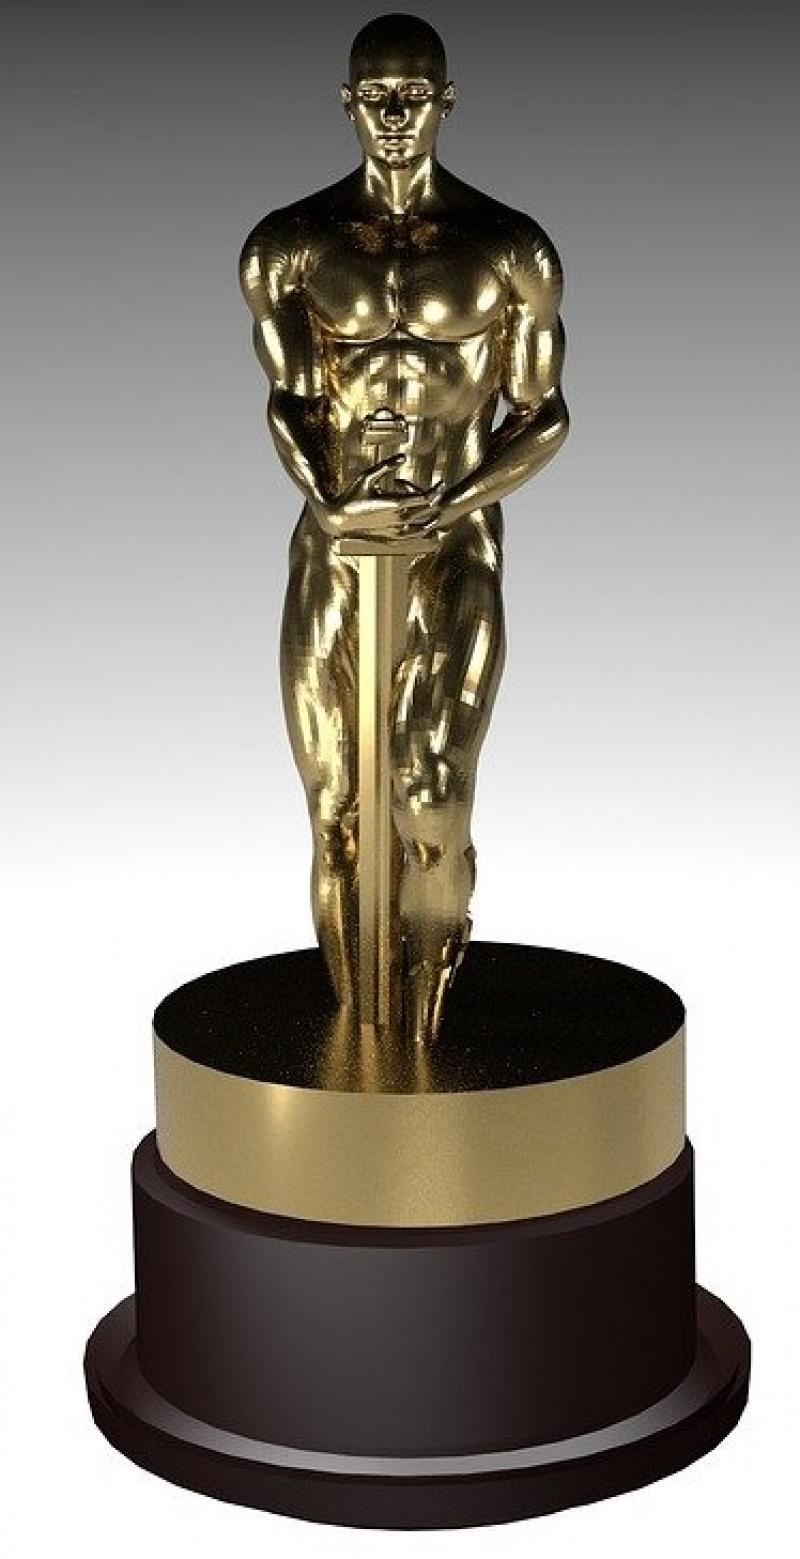 Oscar (pixabay.com/illustrations/oscar-oscars-award-studio-show-2103653)